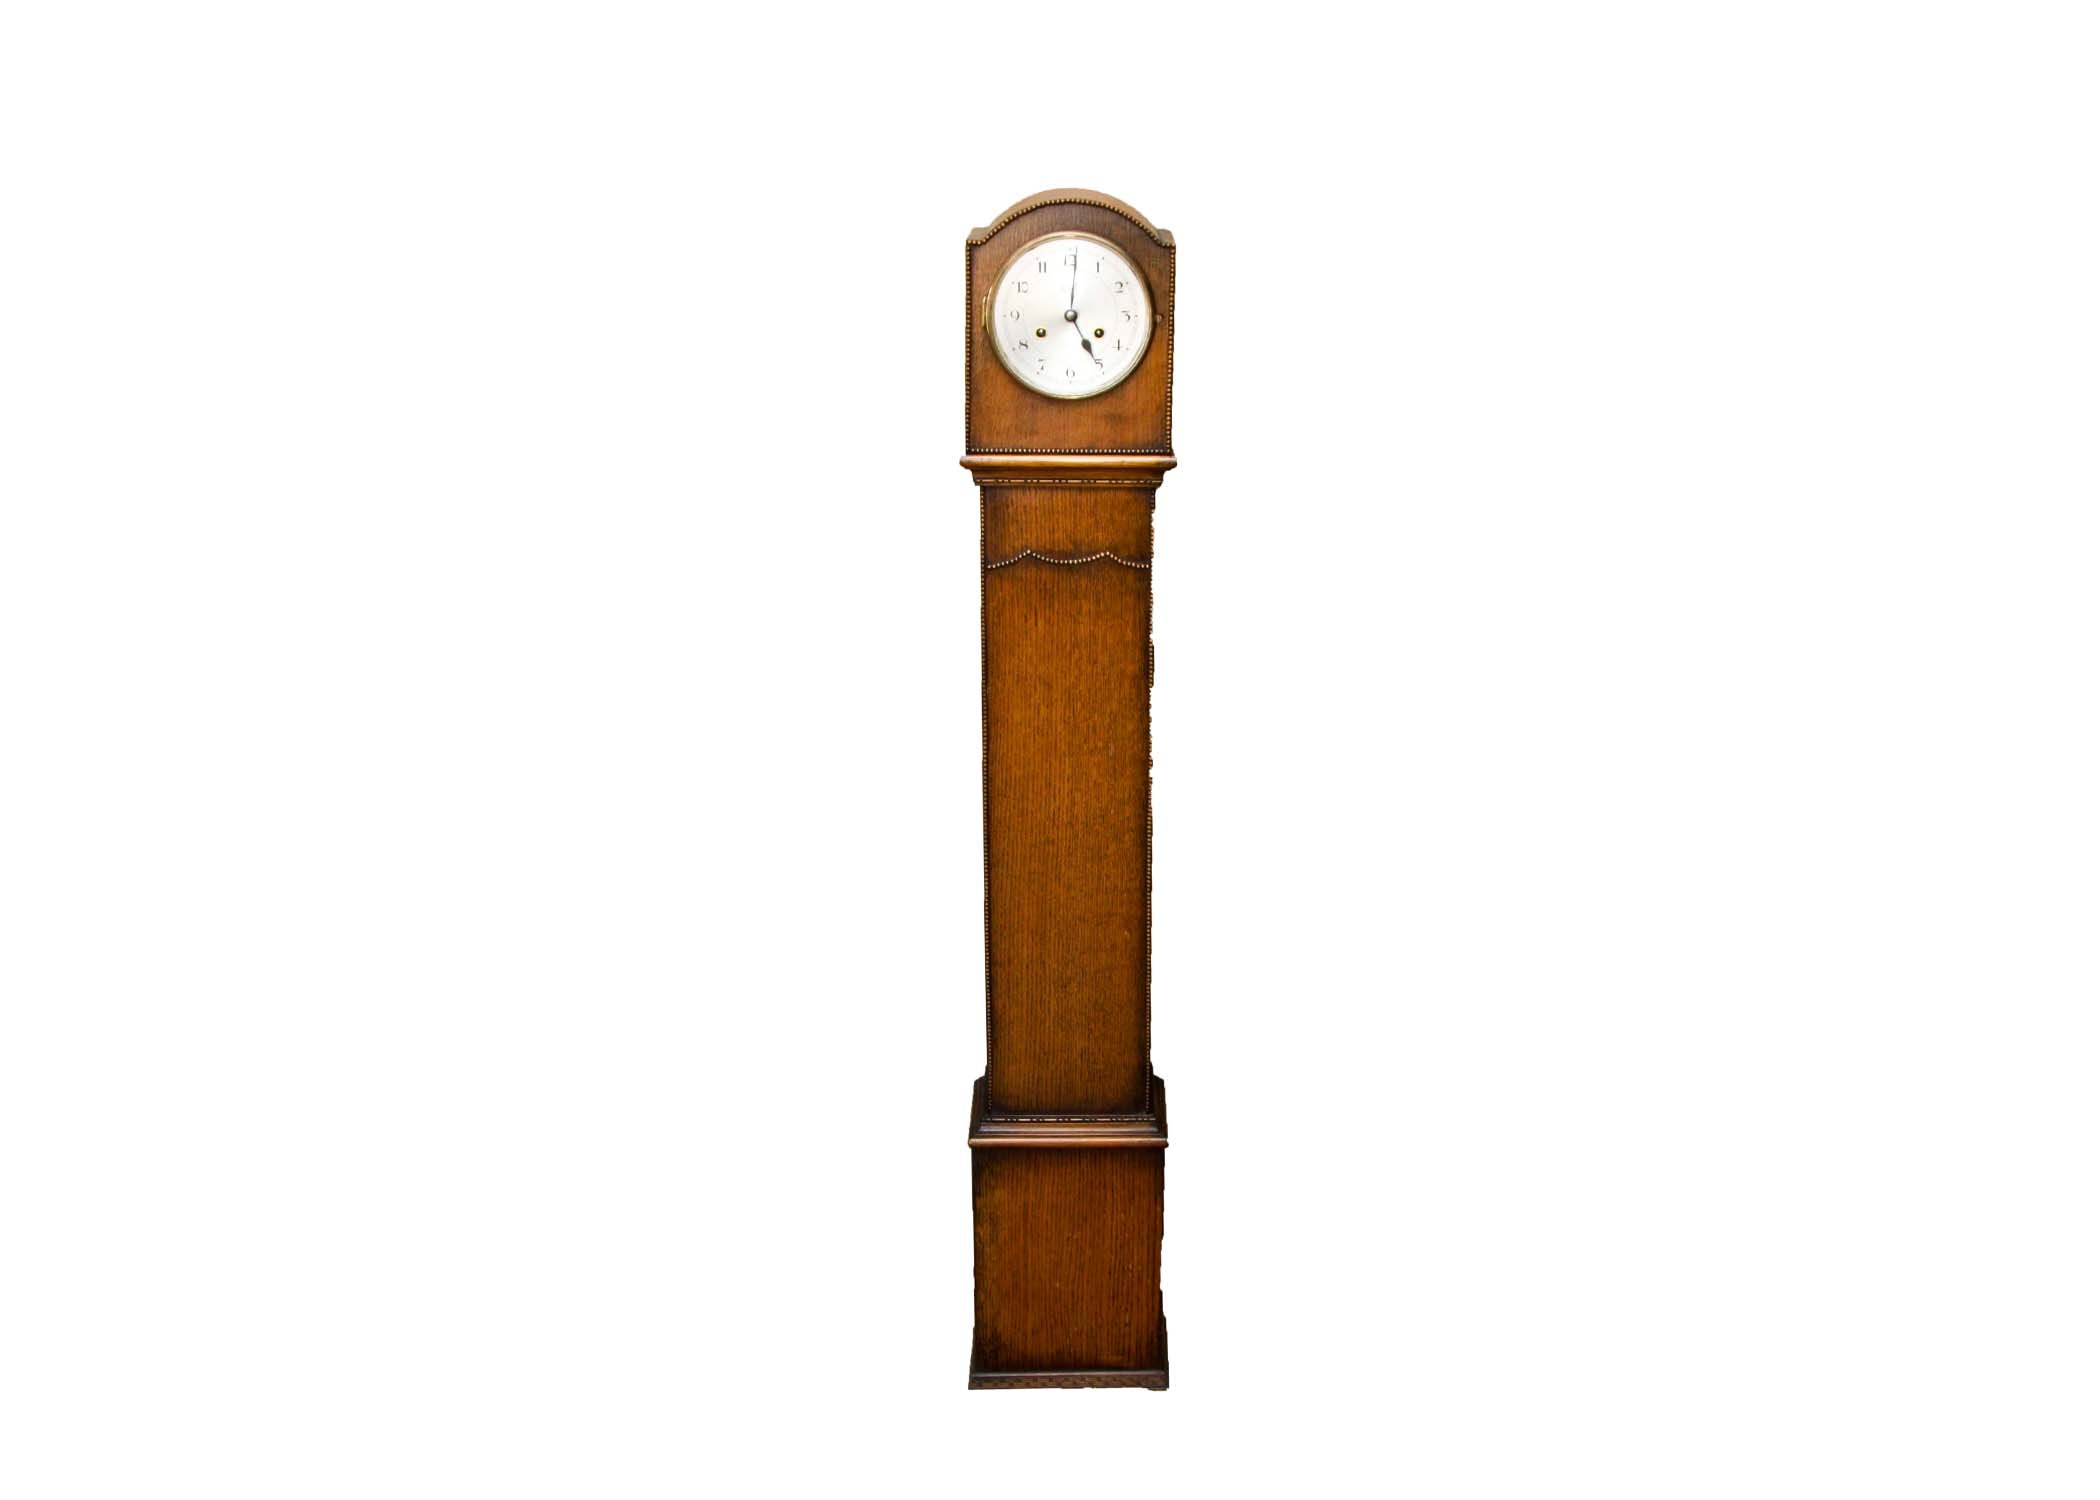 H. Samuel Everite Vintage Grandmother Clock